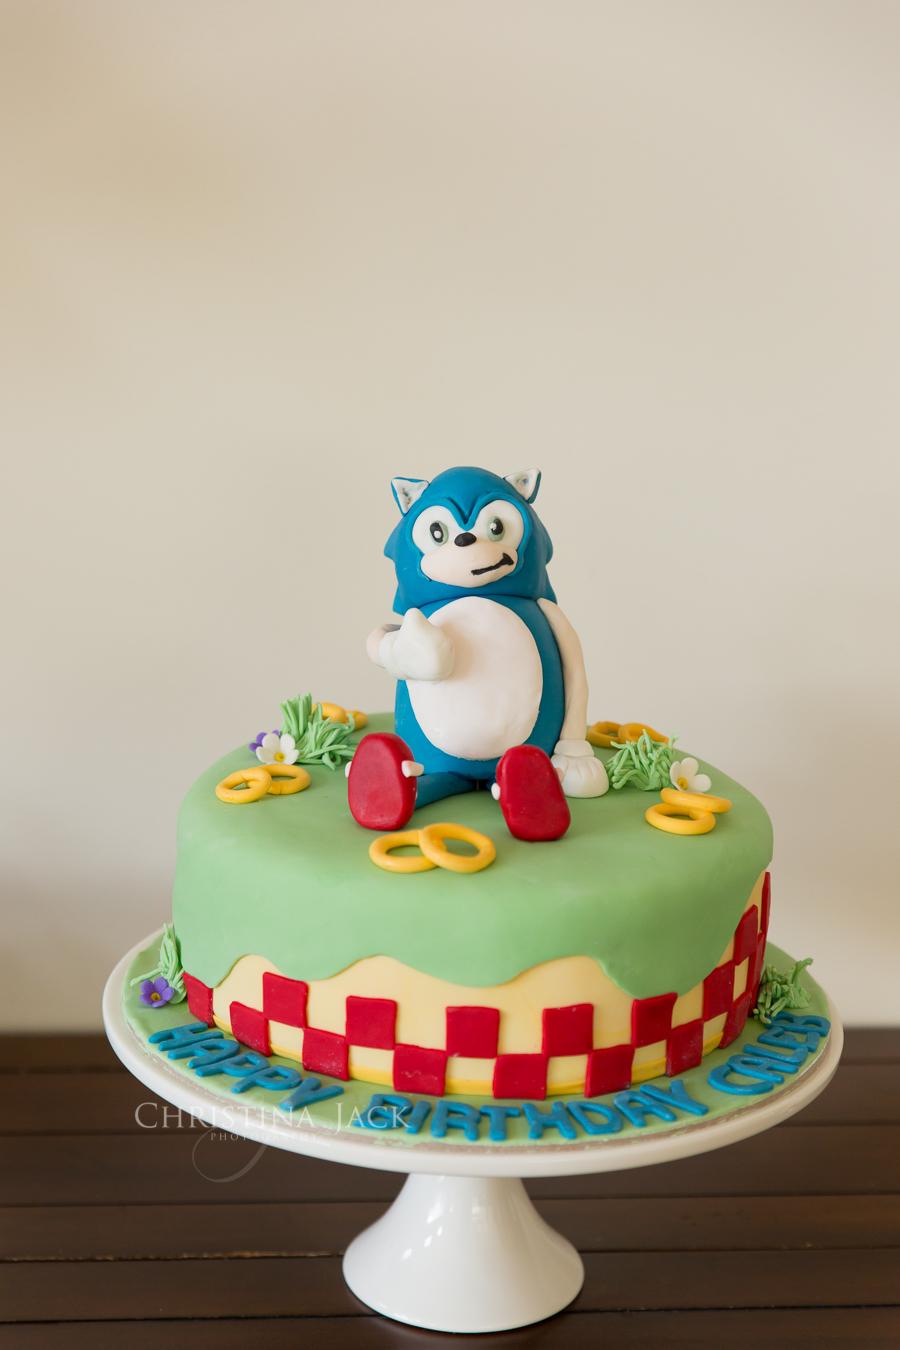 A Special Boy S Sonic The Hedgehog Cake Christina Jack Photography